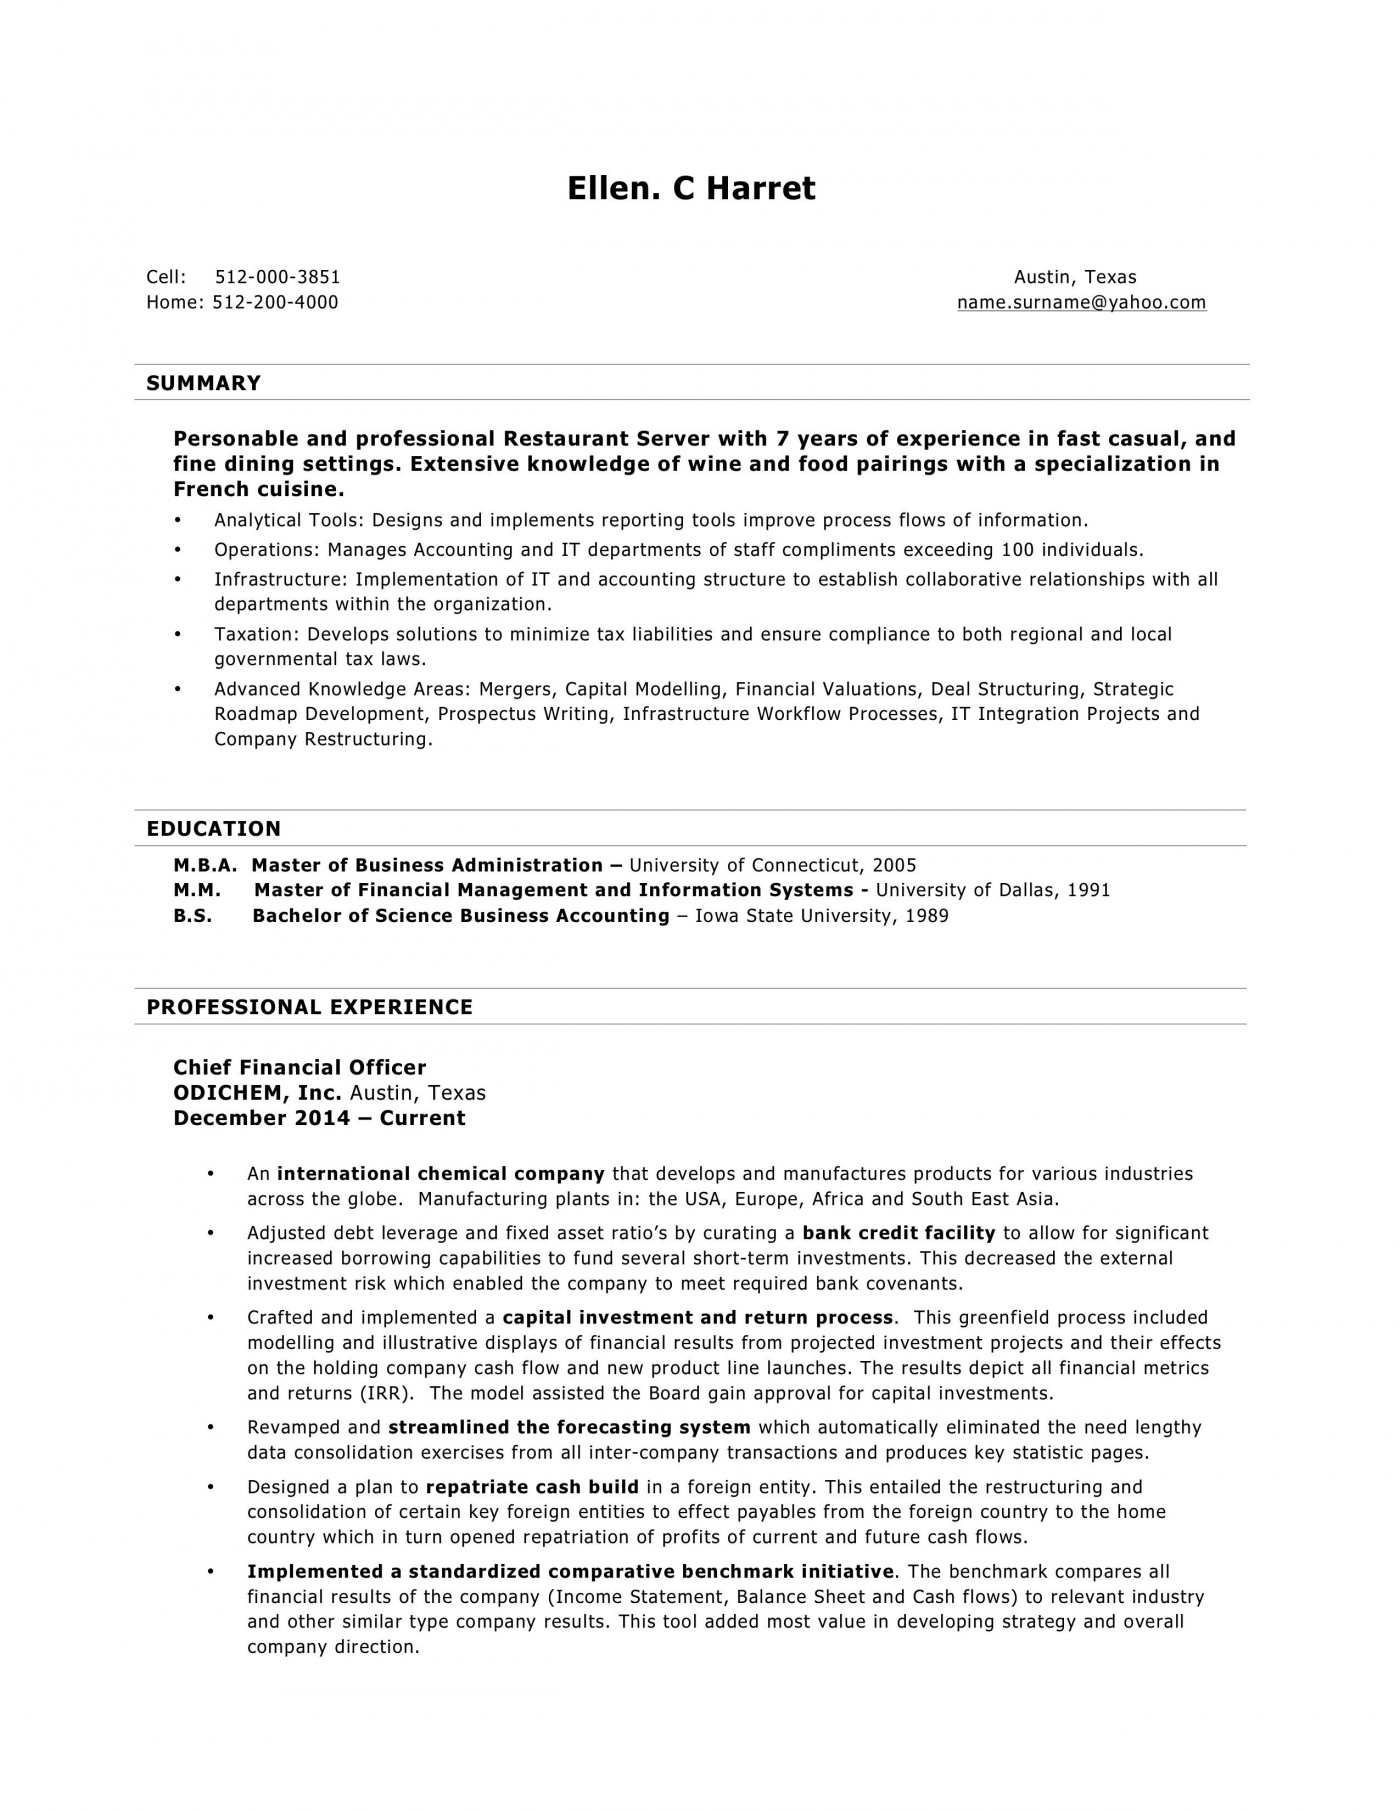 007 Marvelou Microsoft Word Resume Template Highest Quality  Reddit 2019 2010 Free Download1400